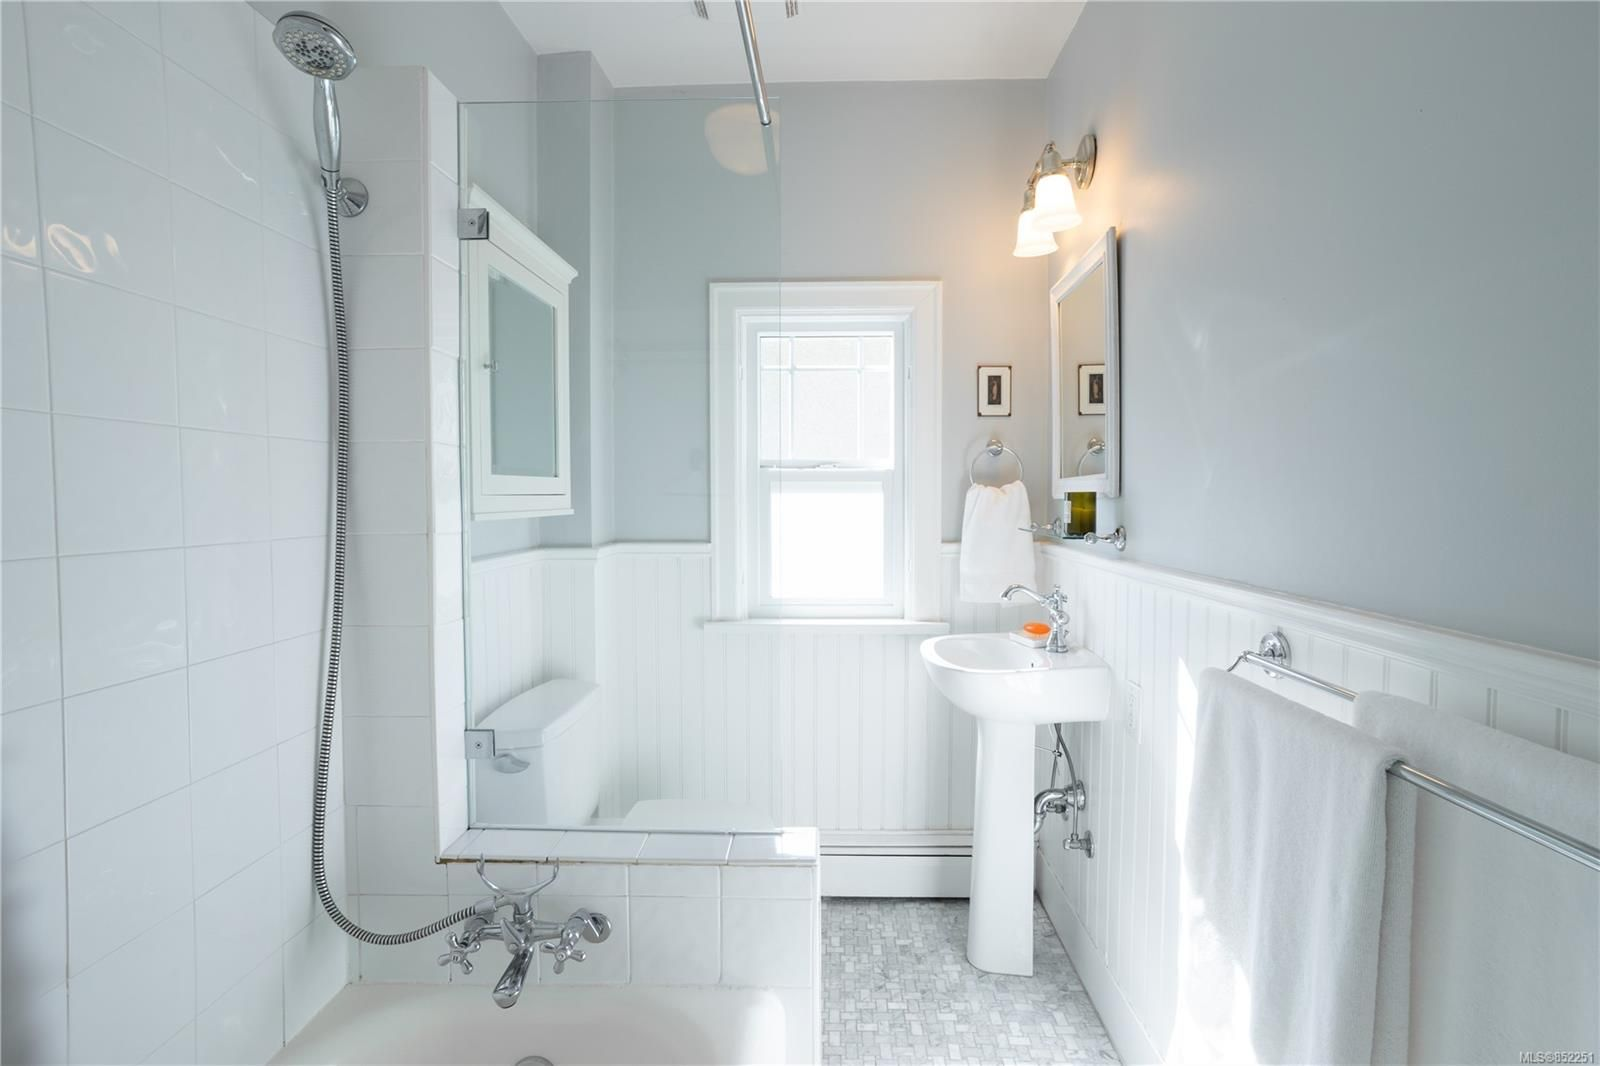 Photo 17: Photos: 2363 Pacific Ave in : OB Estevan House for sale (Oak Bay)  : MLS®# 852251